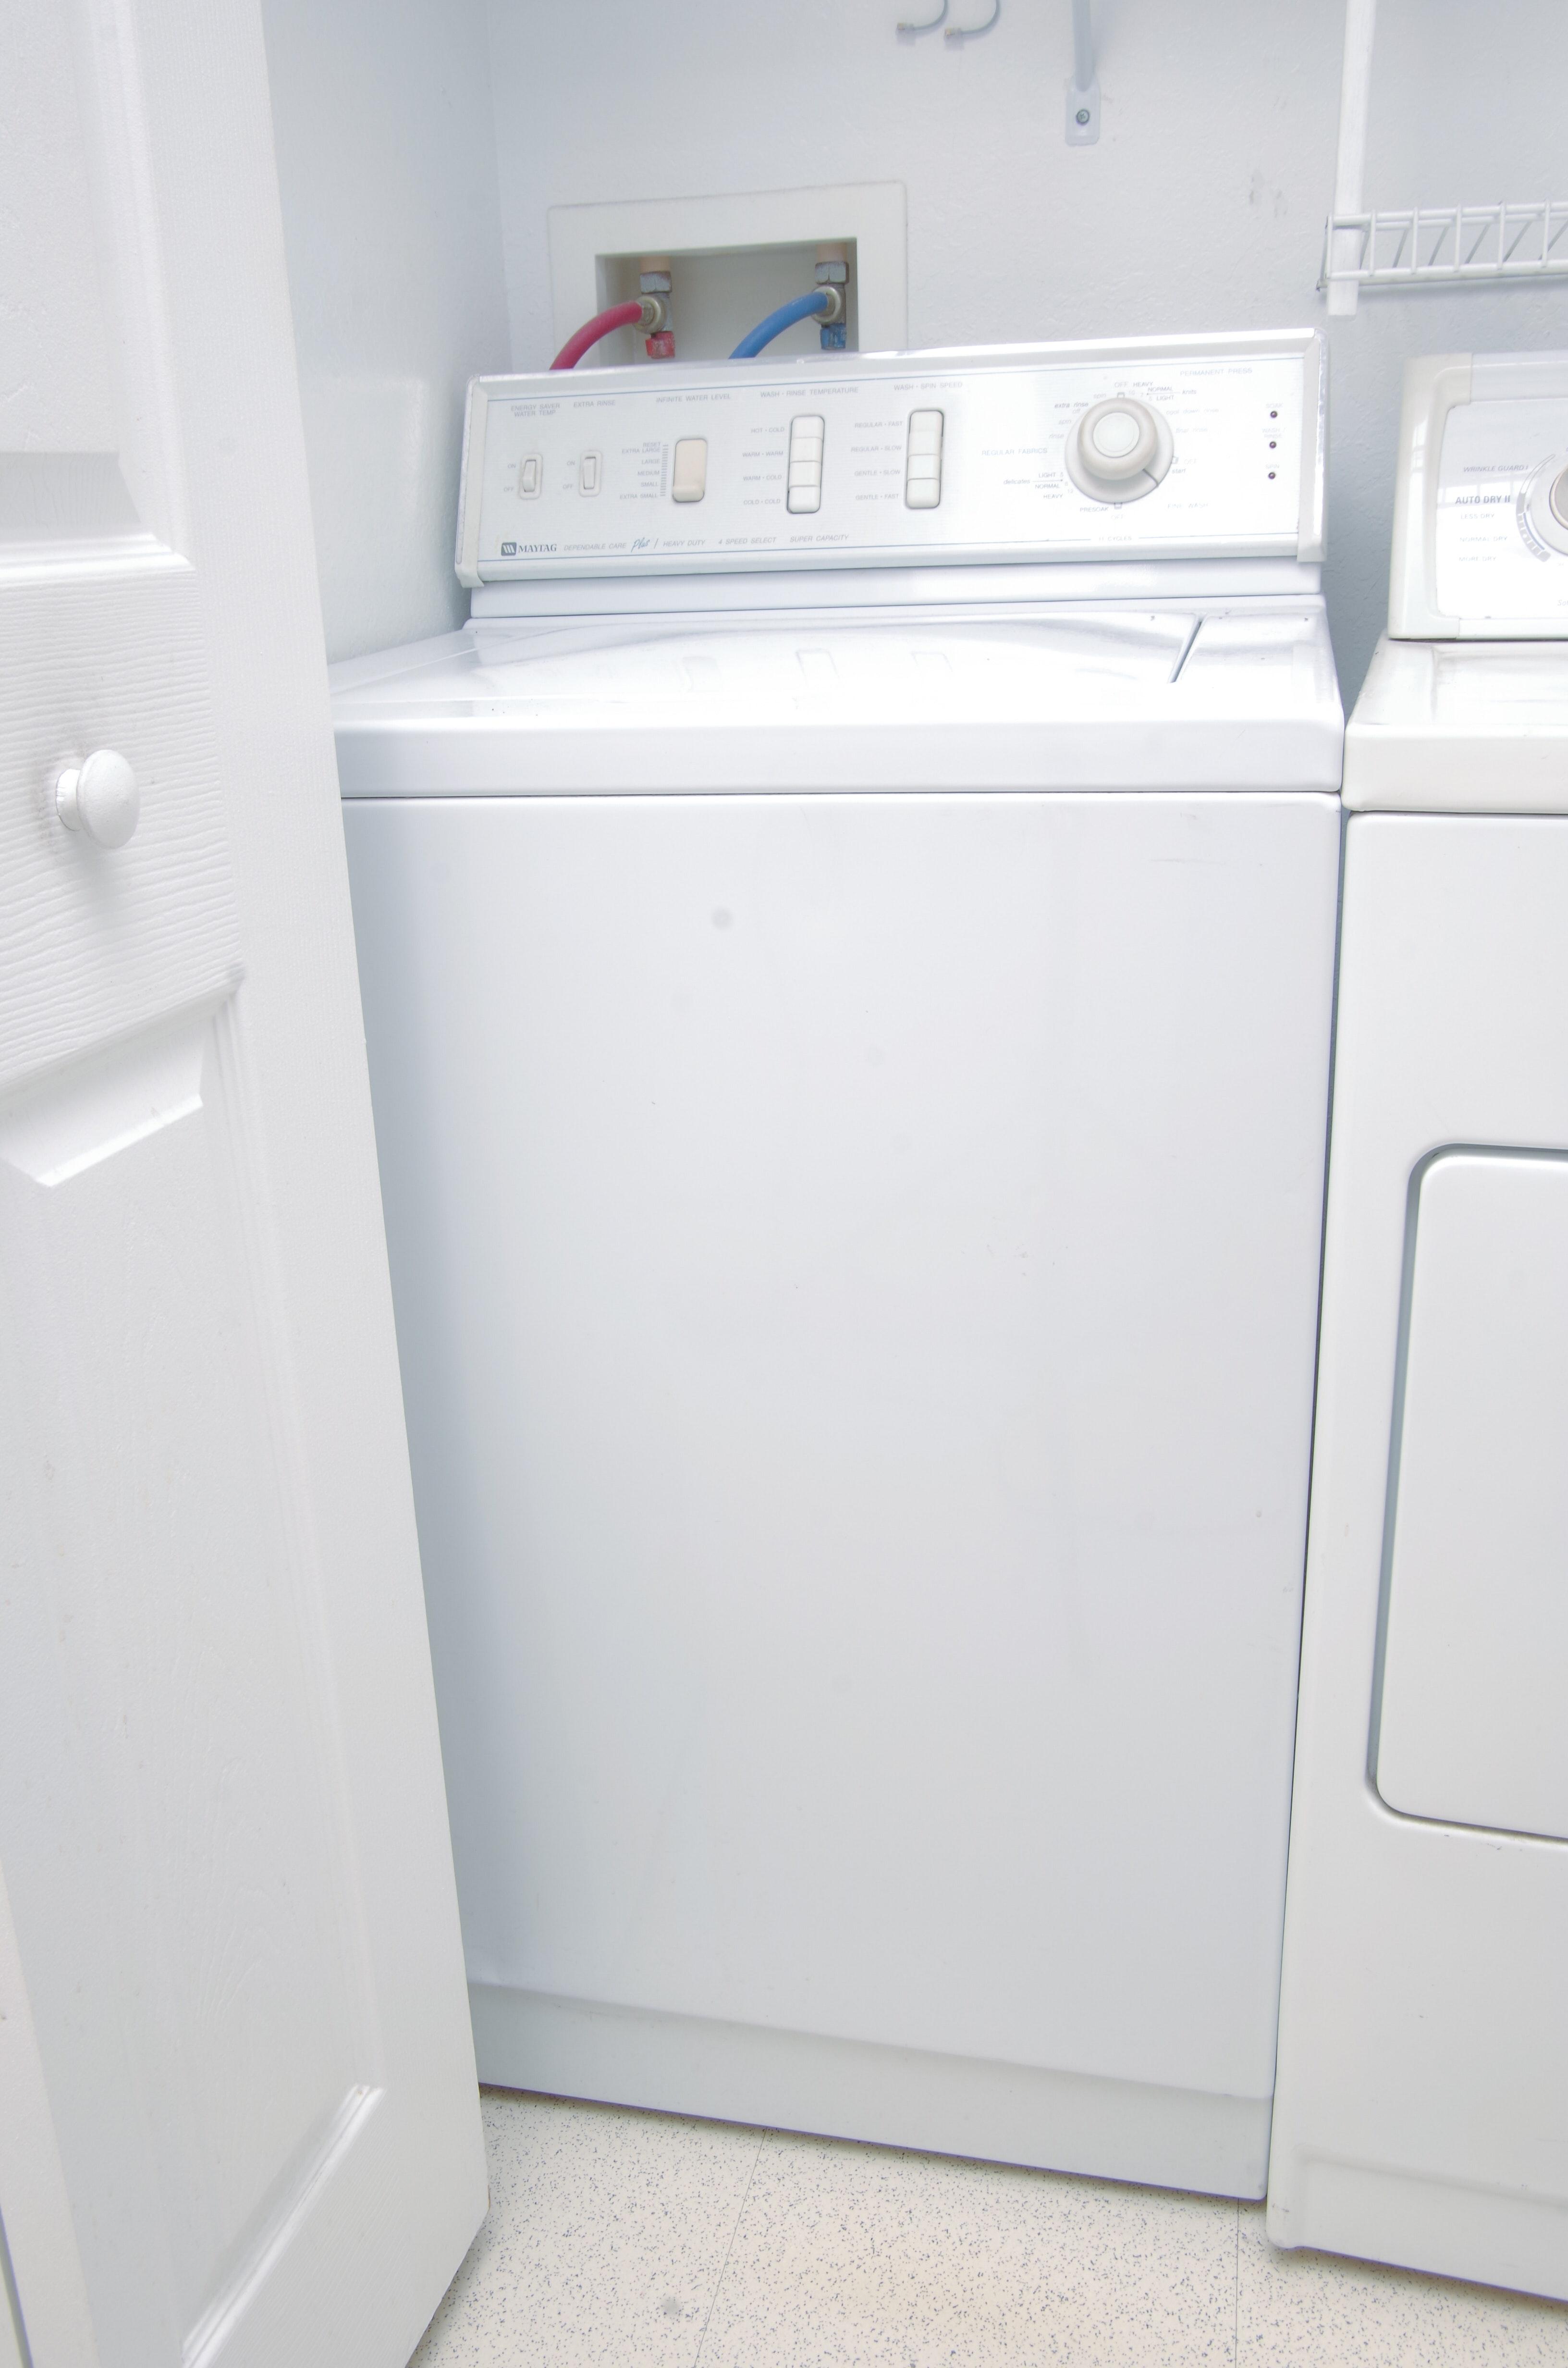 maytag series 100 washing machine